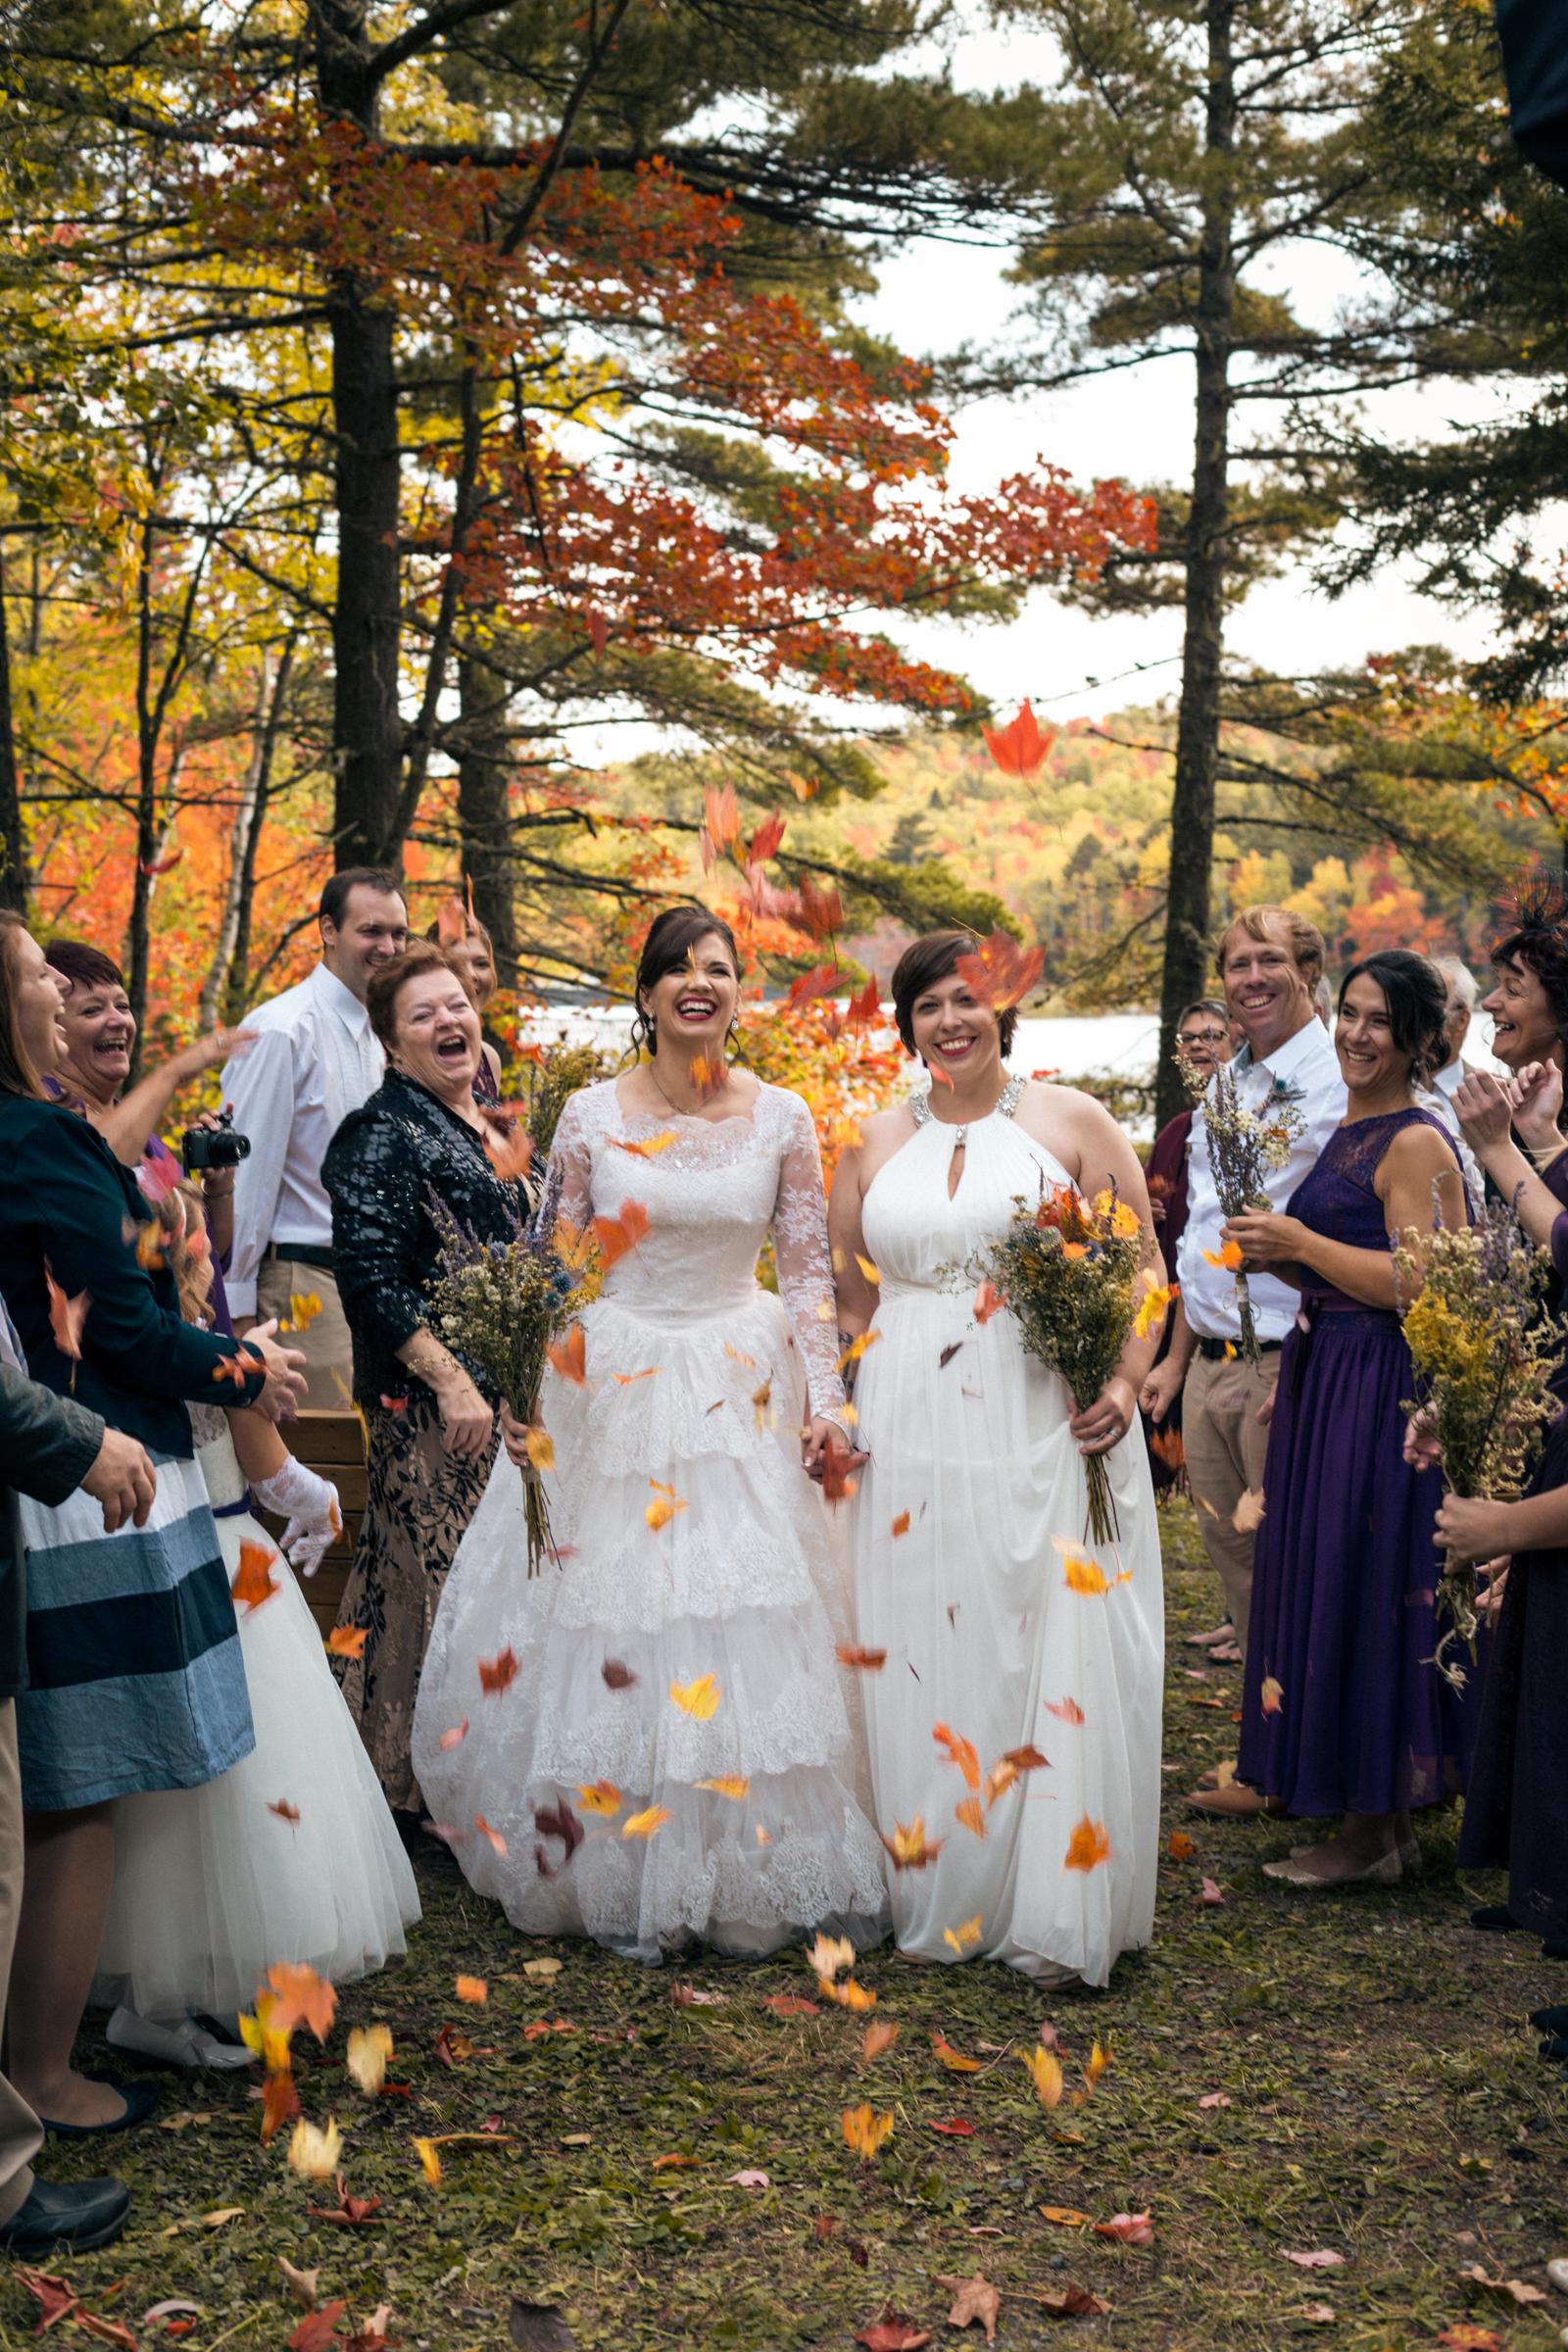 201610_k&c_wedding_2106.jpg